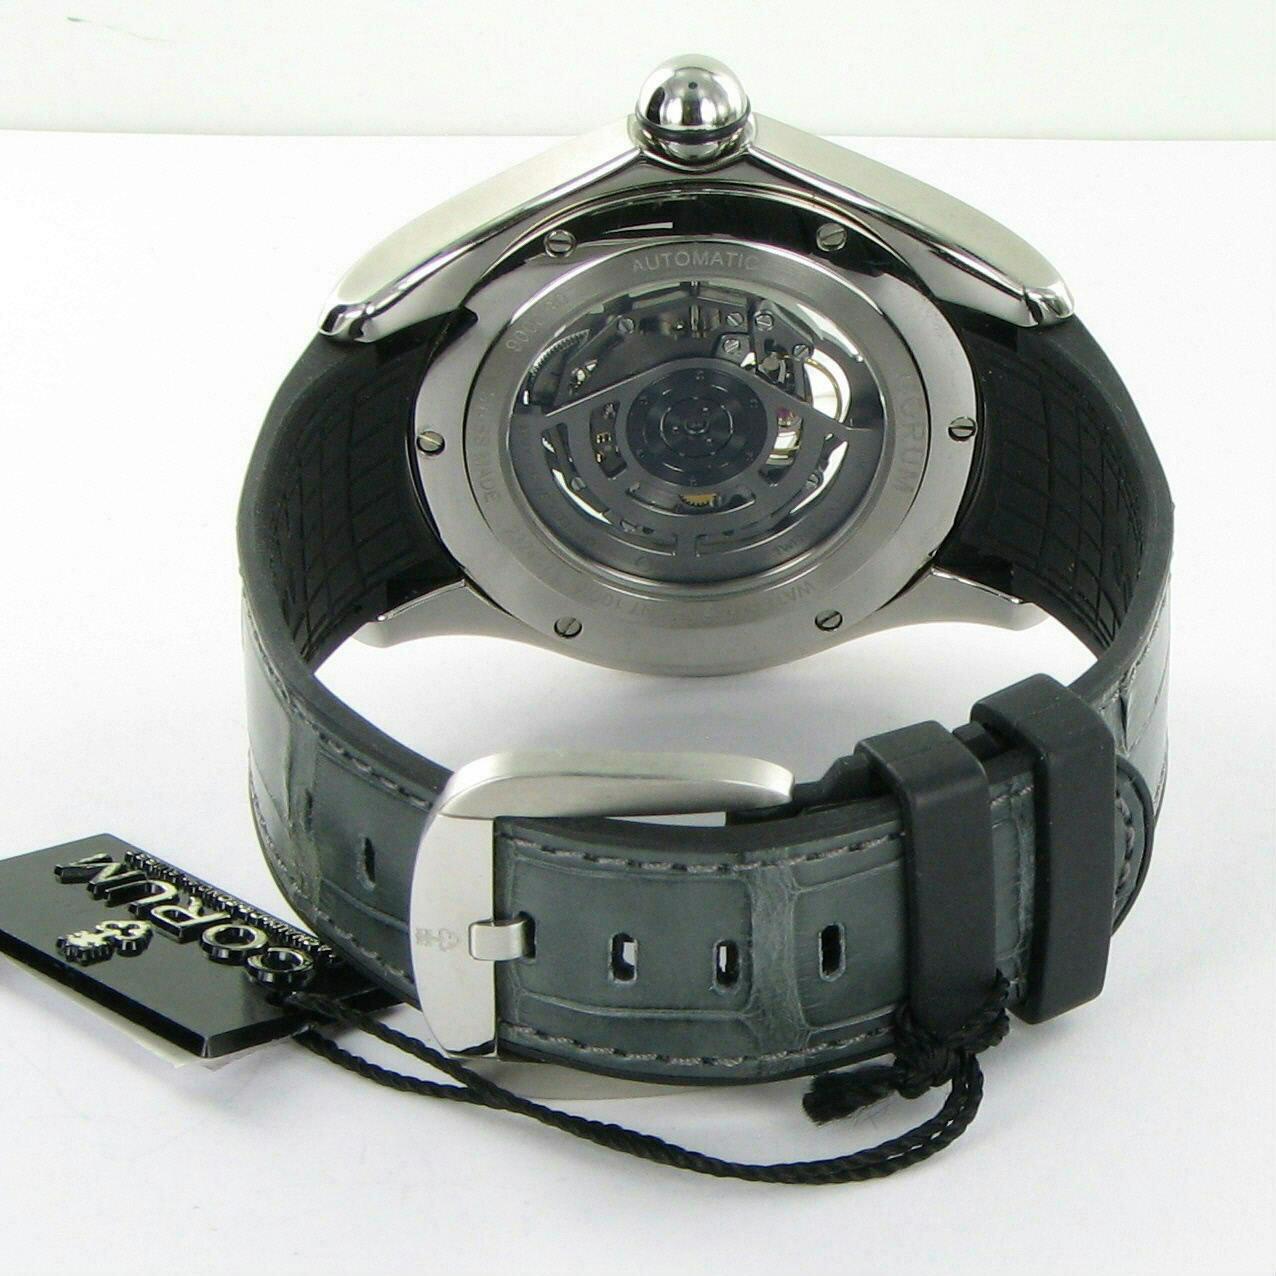 Corum Bubble Squelette Skeleton Automatic L082/02595 47mm Watch NWT $8300